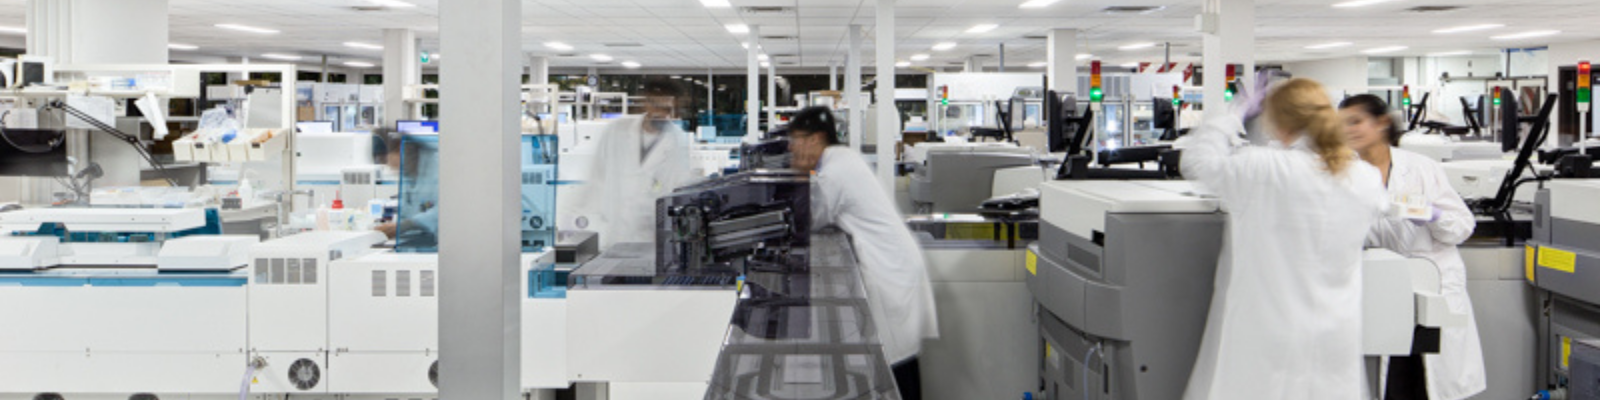 Image of a lab interior